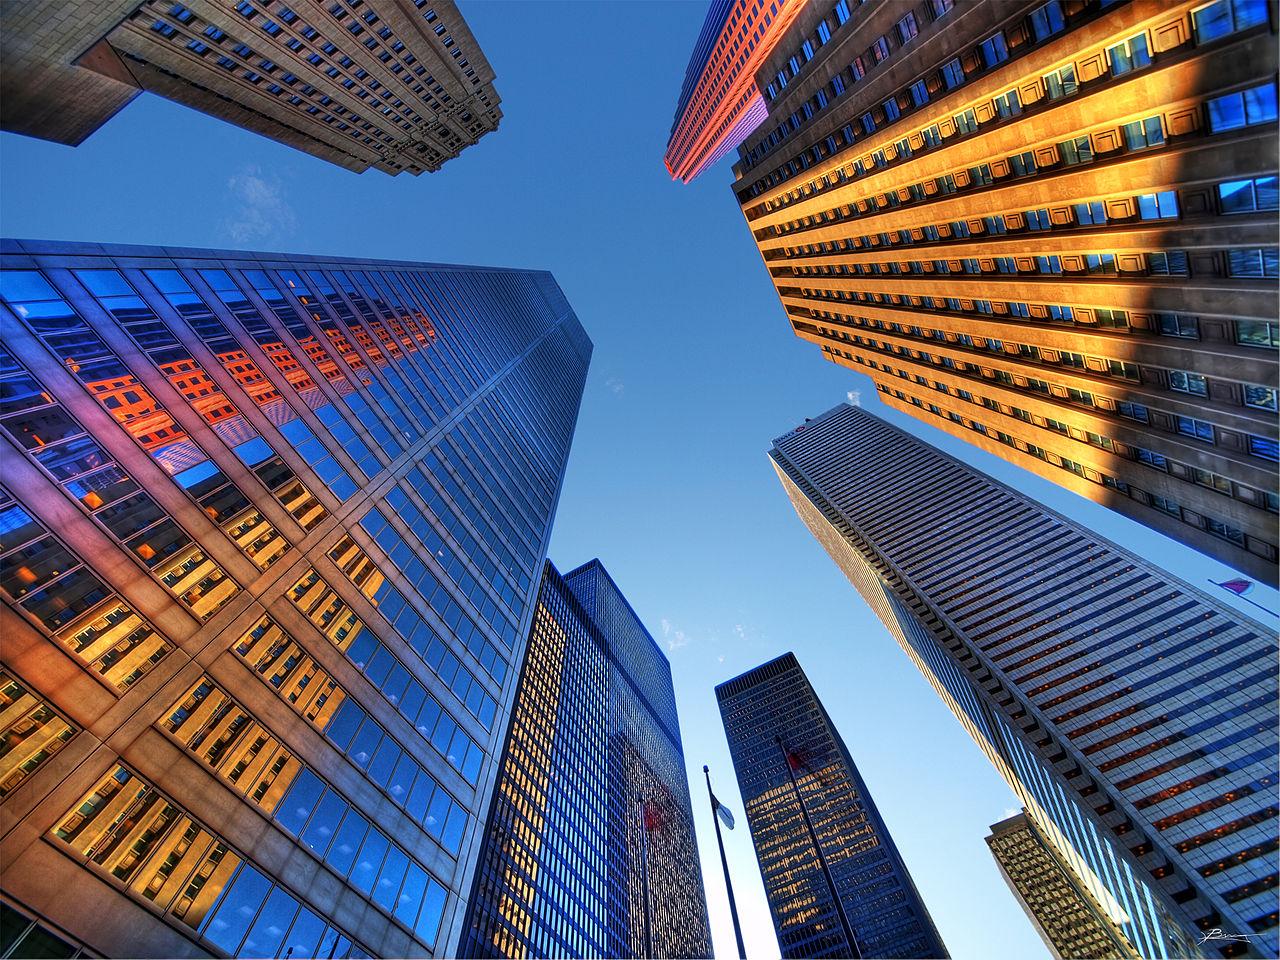 King Street West, Toronto